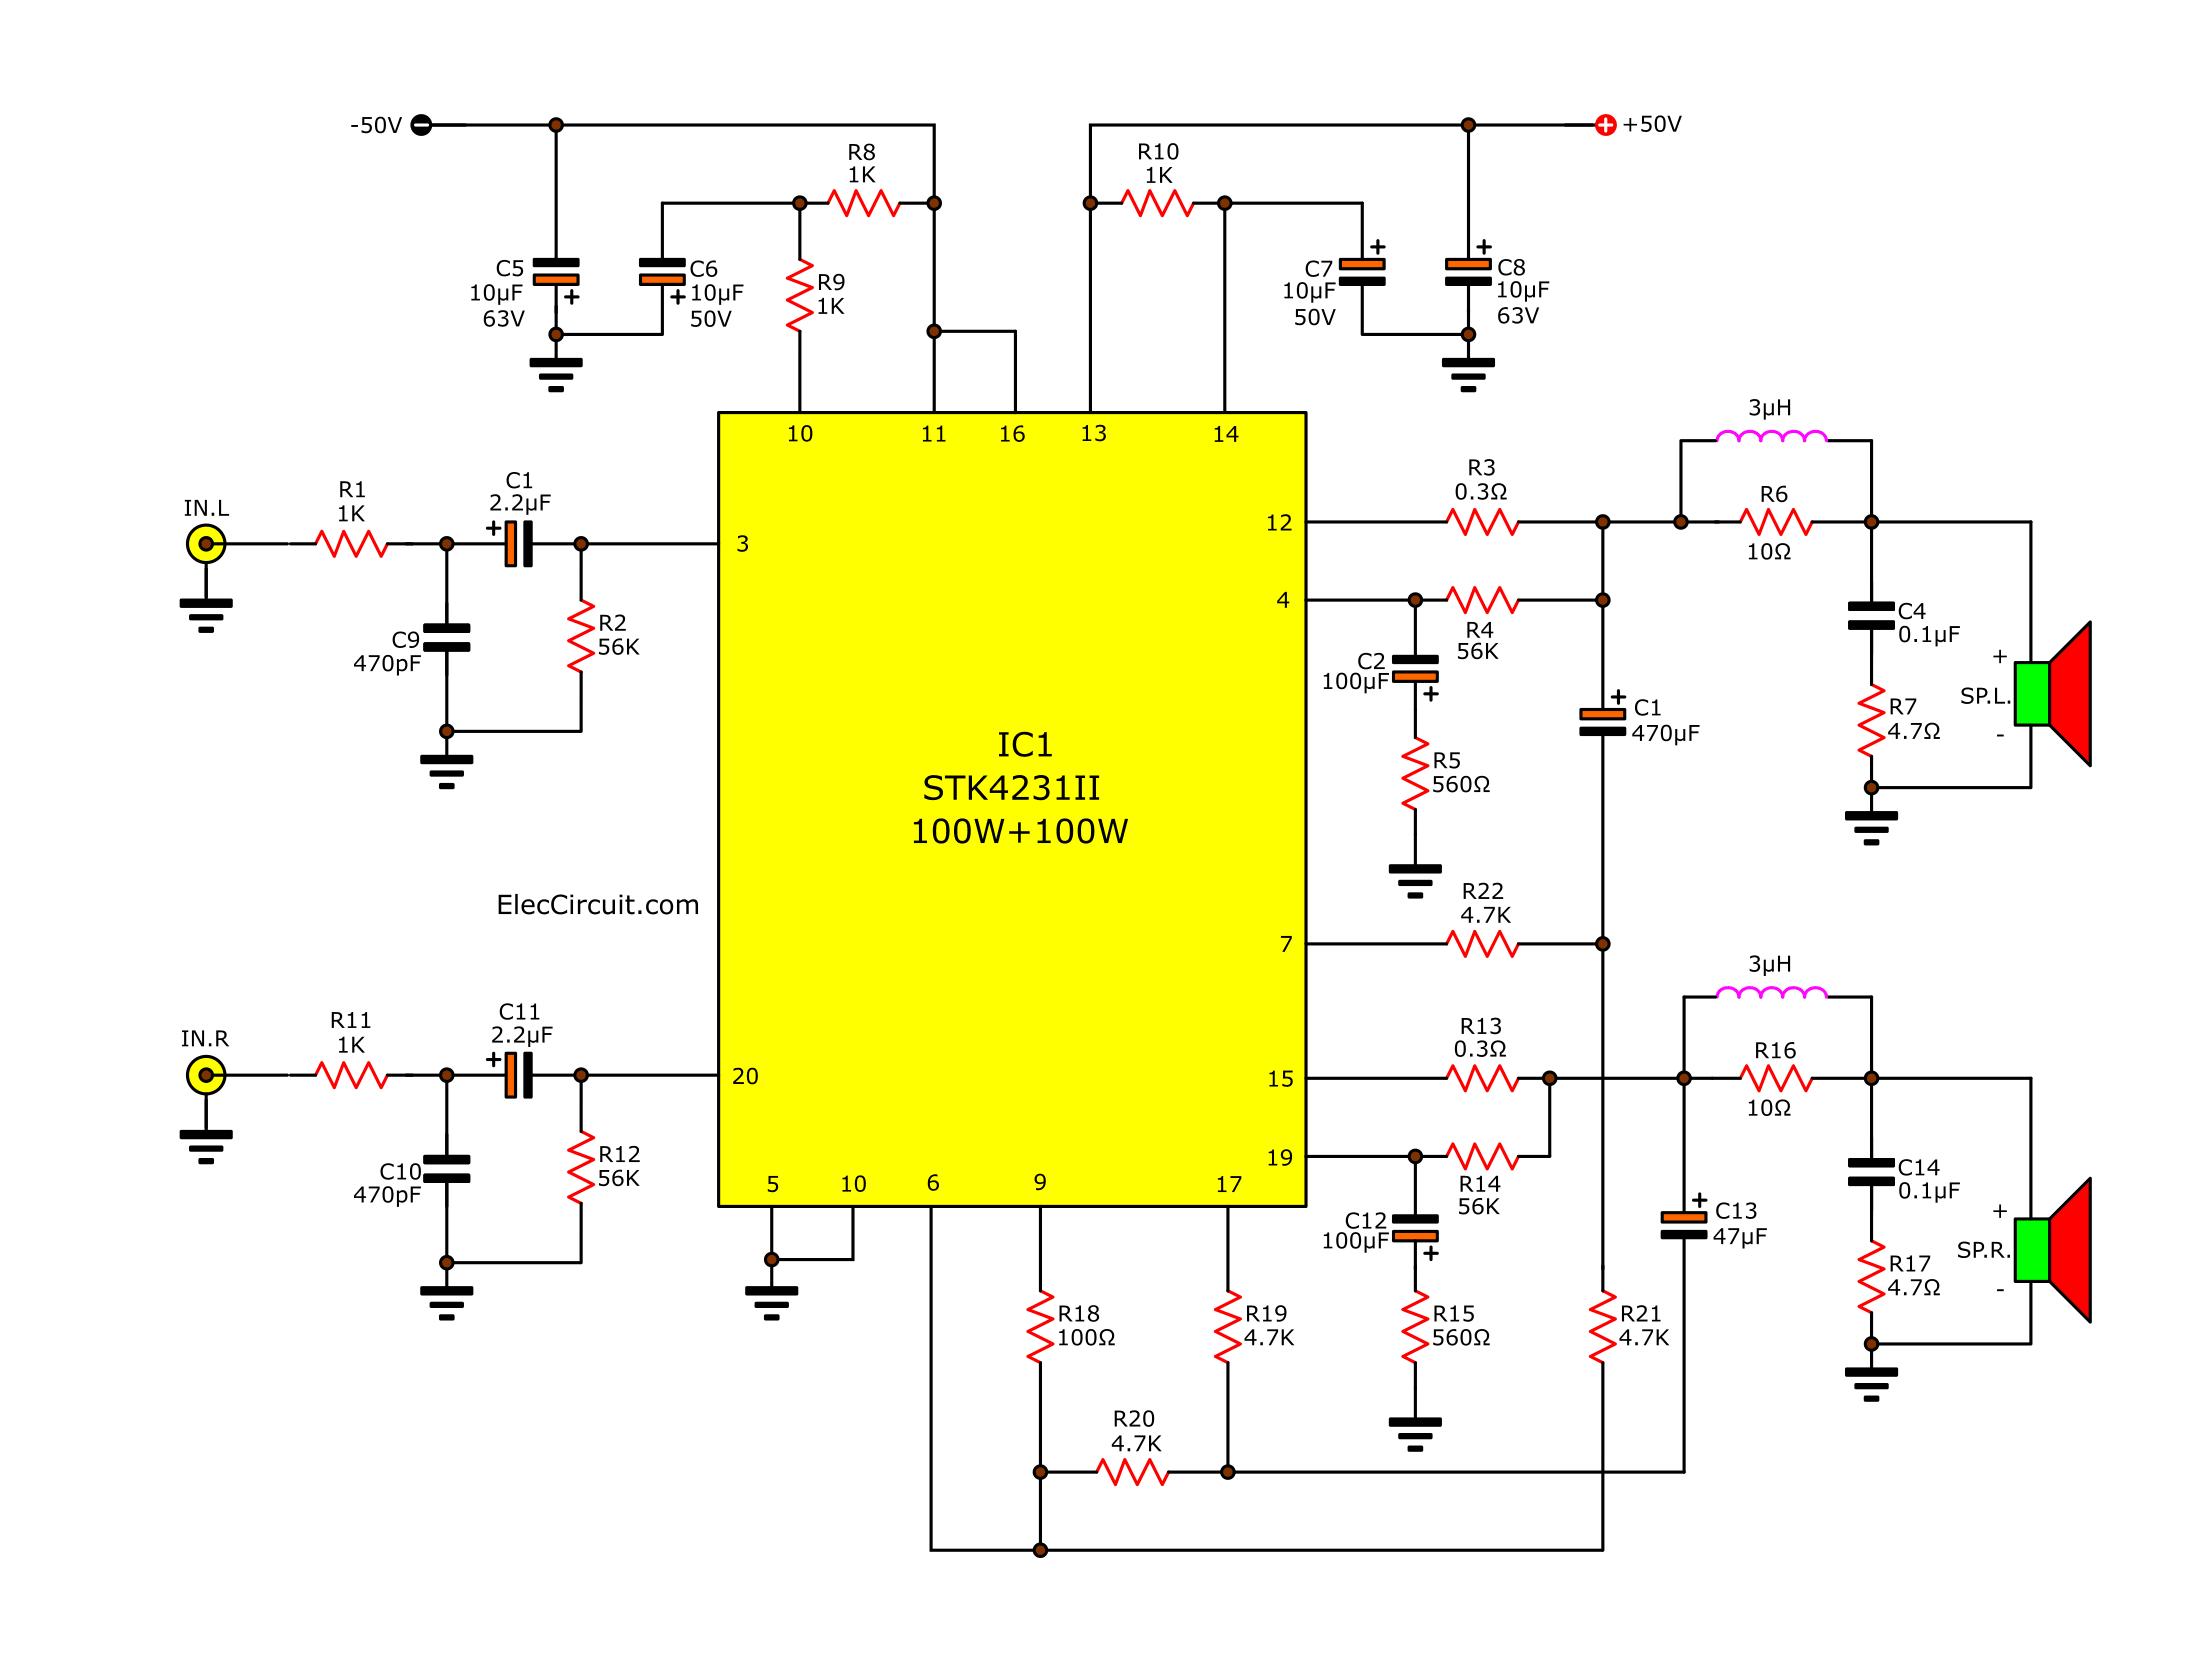 C11 Pc Wiring Diagram 2 Channel 100w Stereo Audio Amplifier Circuit By Stk4231ii